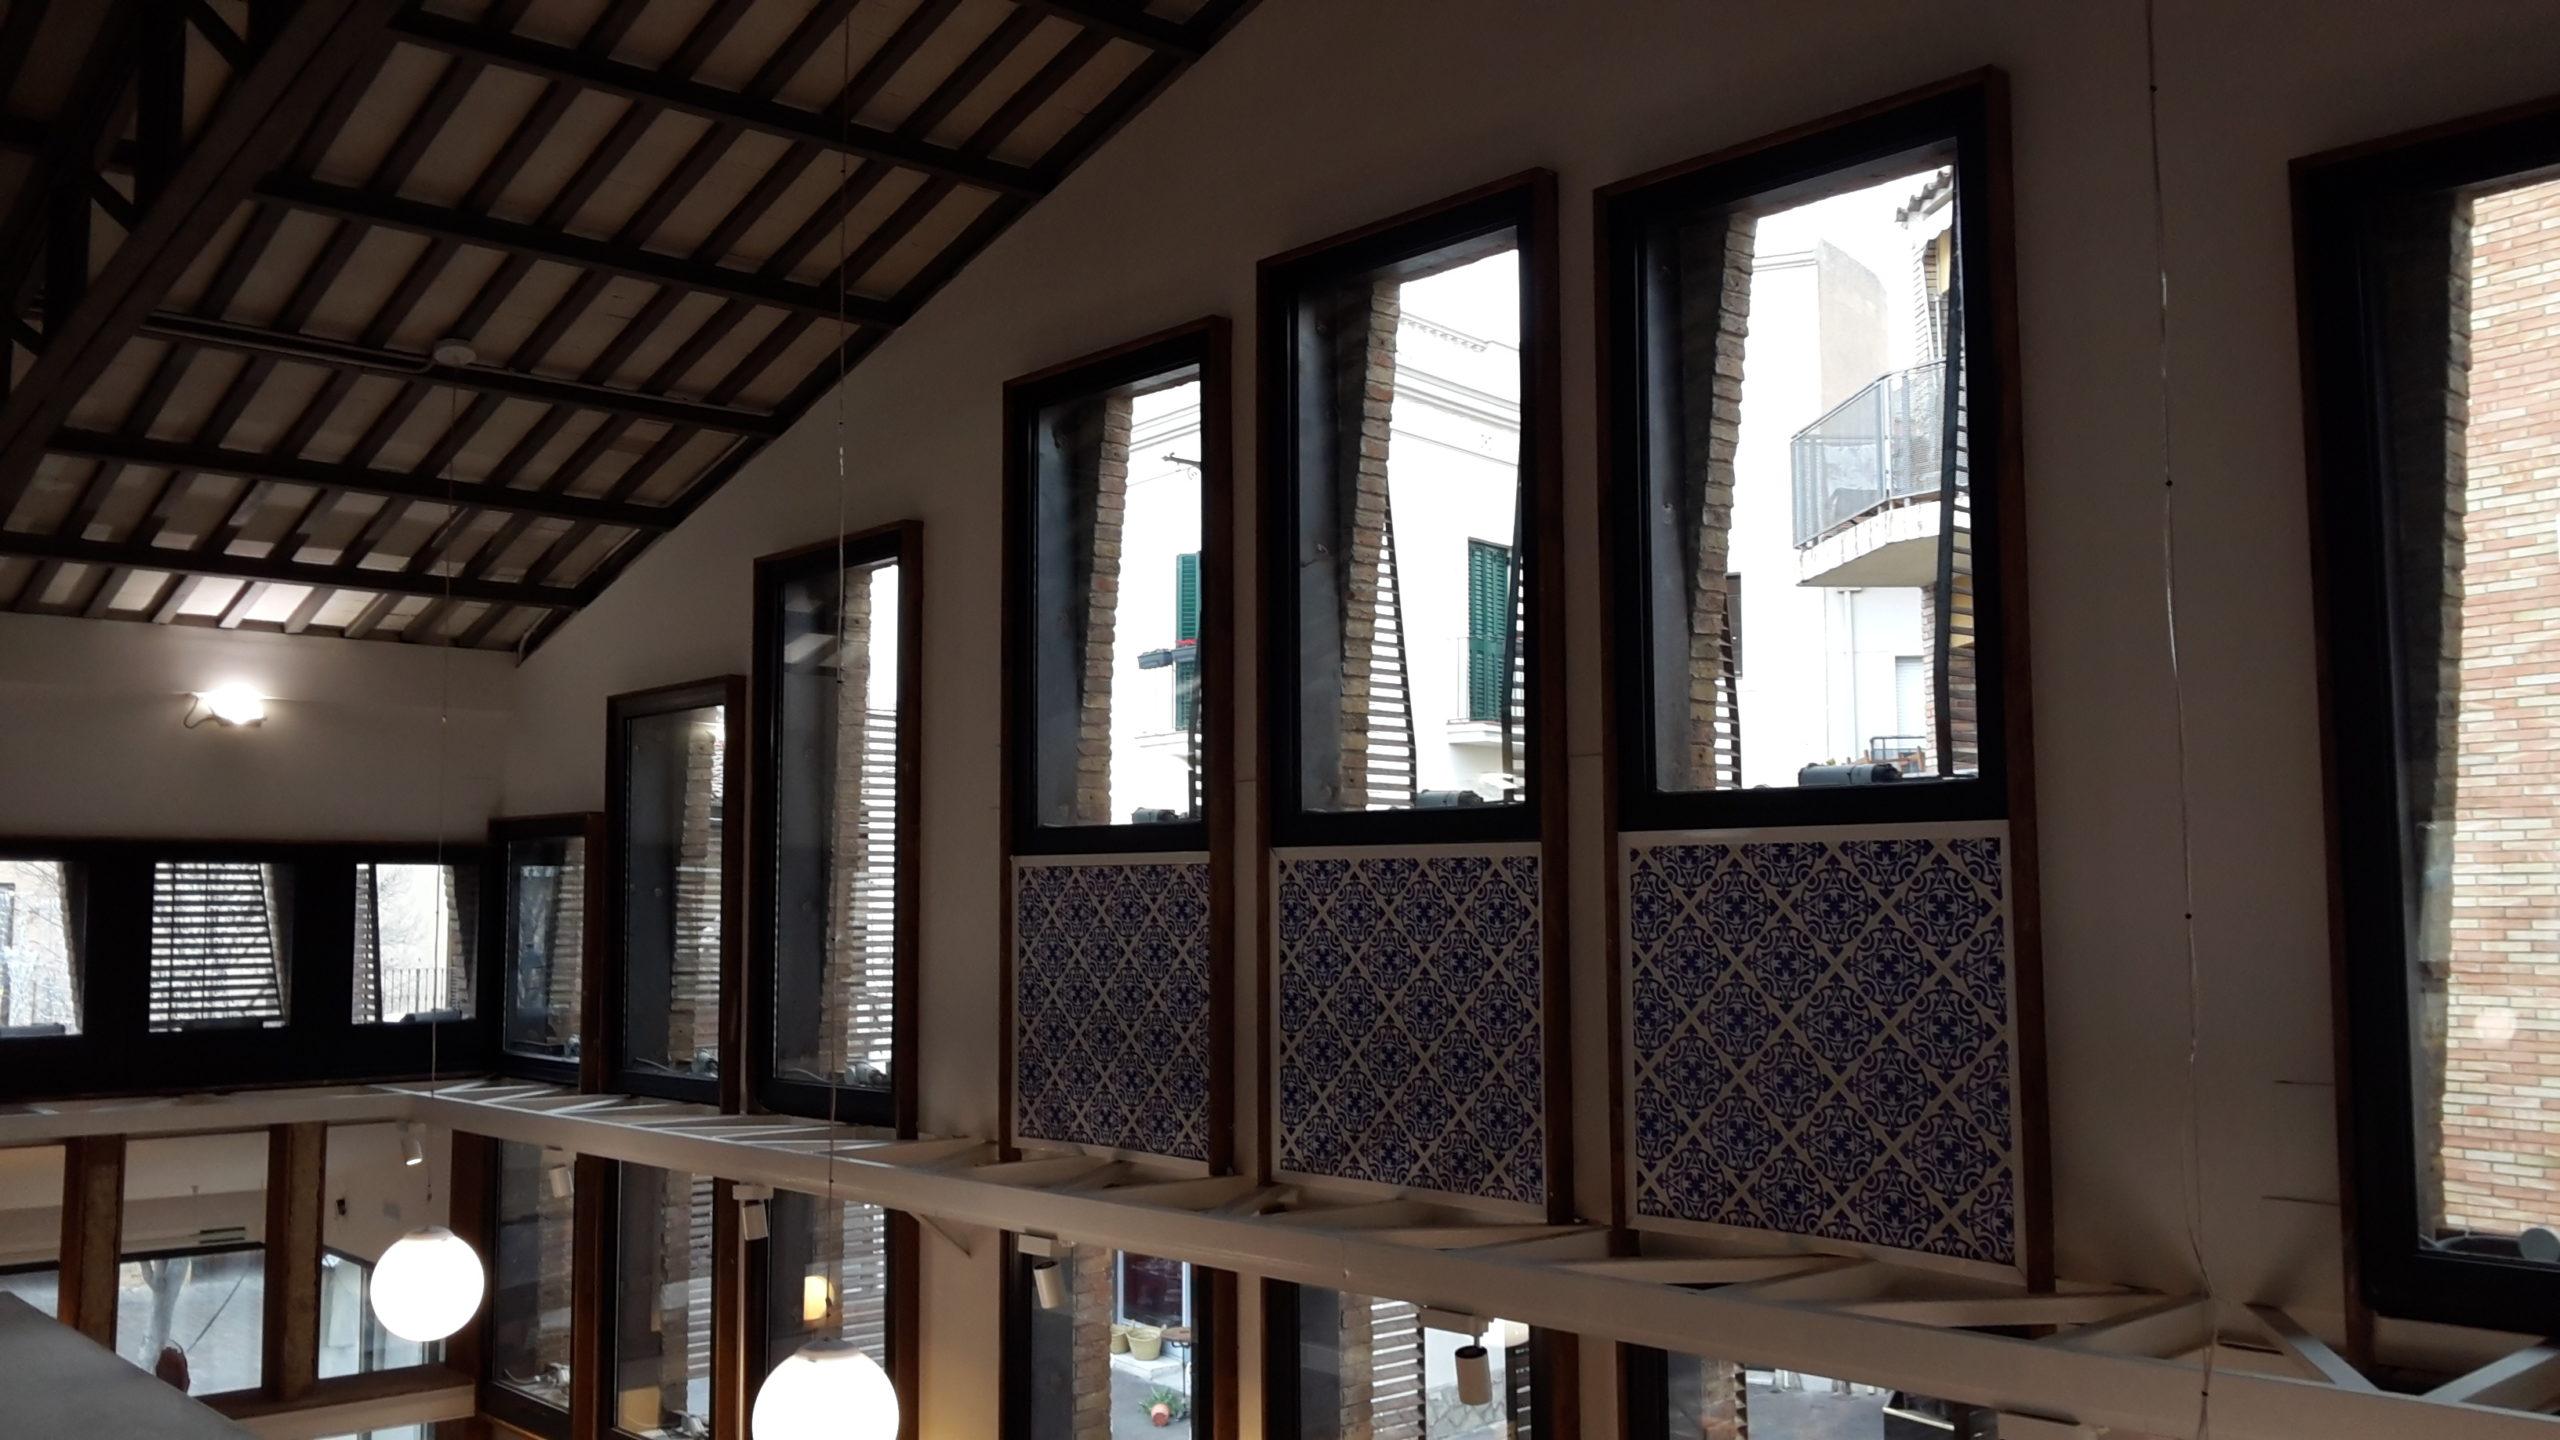 Inside view lighting and windows